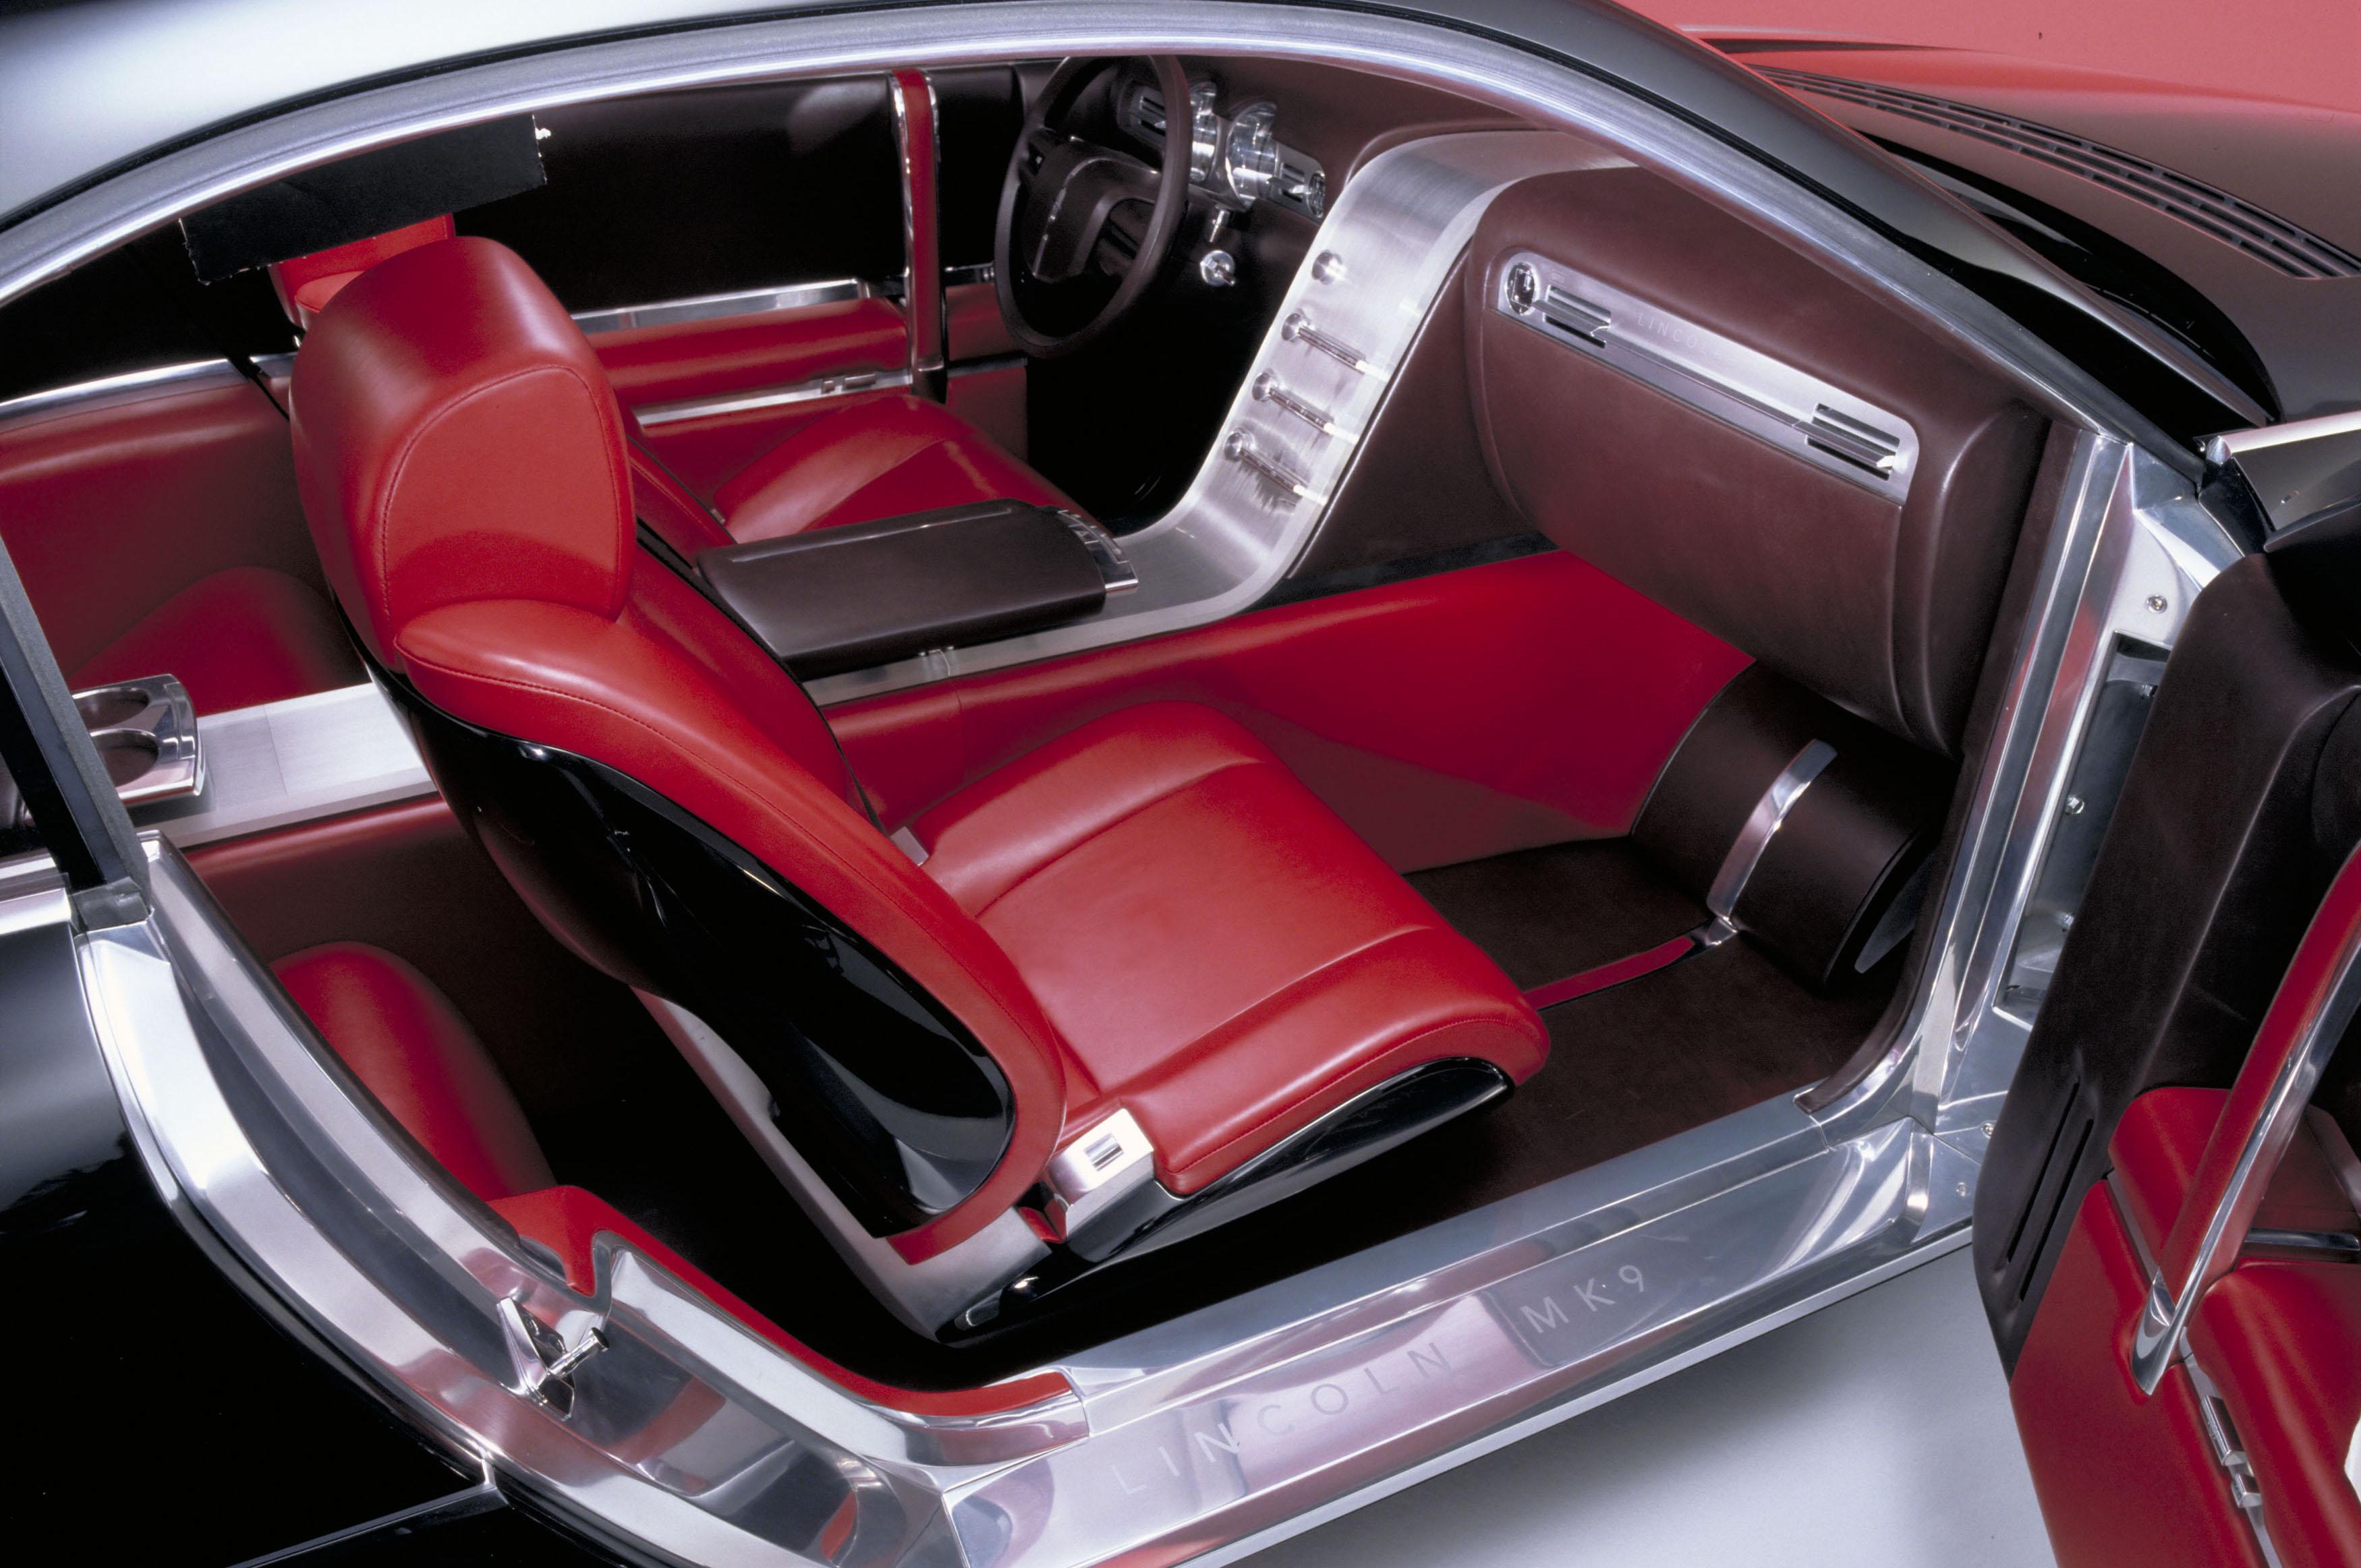 http://st.automobilemag.com/uploads/sites/11/2015/12/2001-lincoln-mk9-interior.jpg